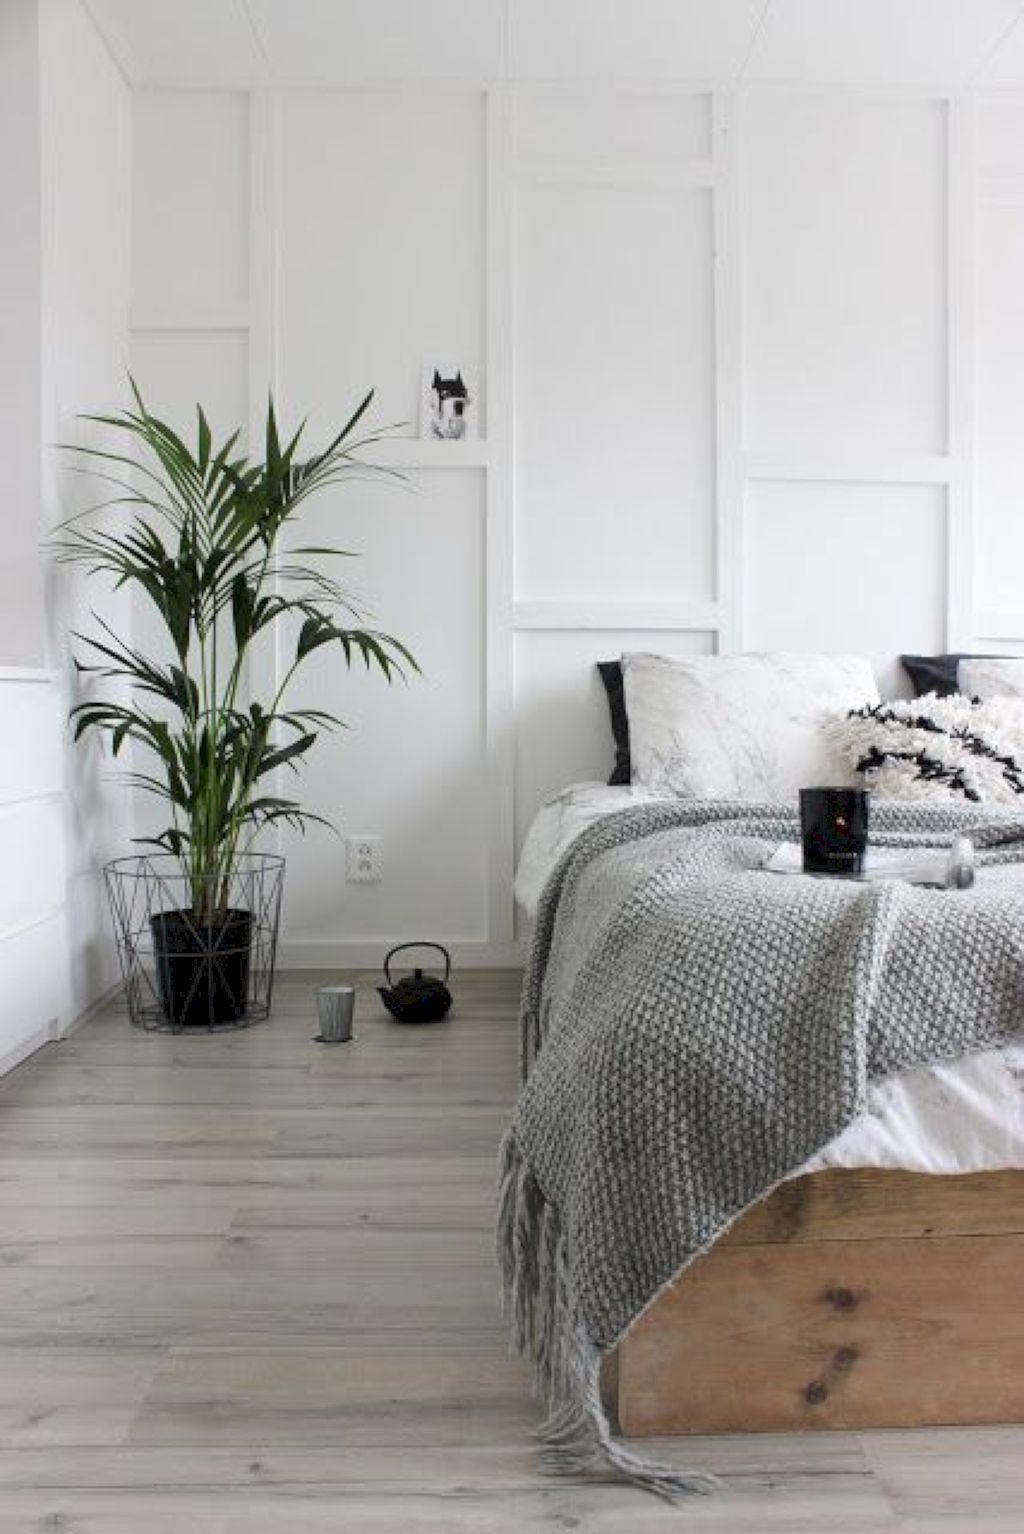 Cool 50 Comfy Minimalist Bedroom Decor And Design Ideas Https